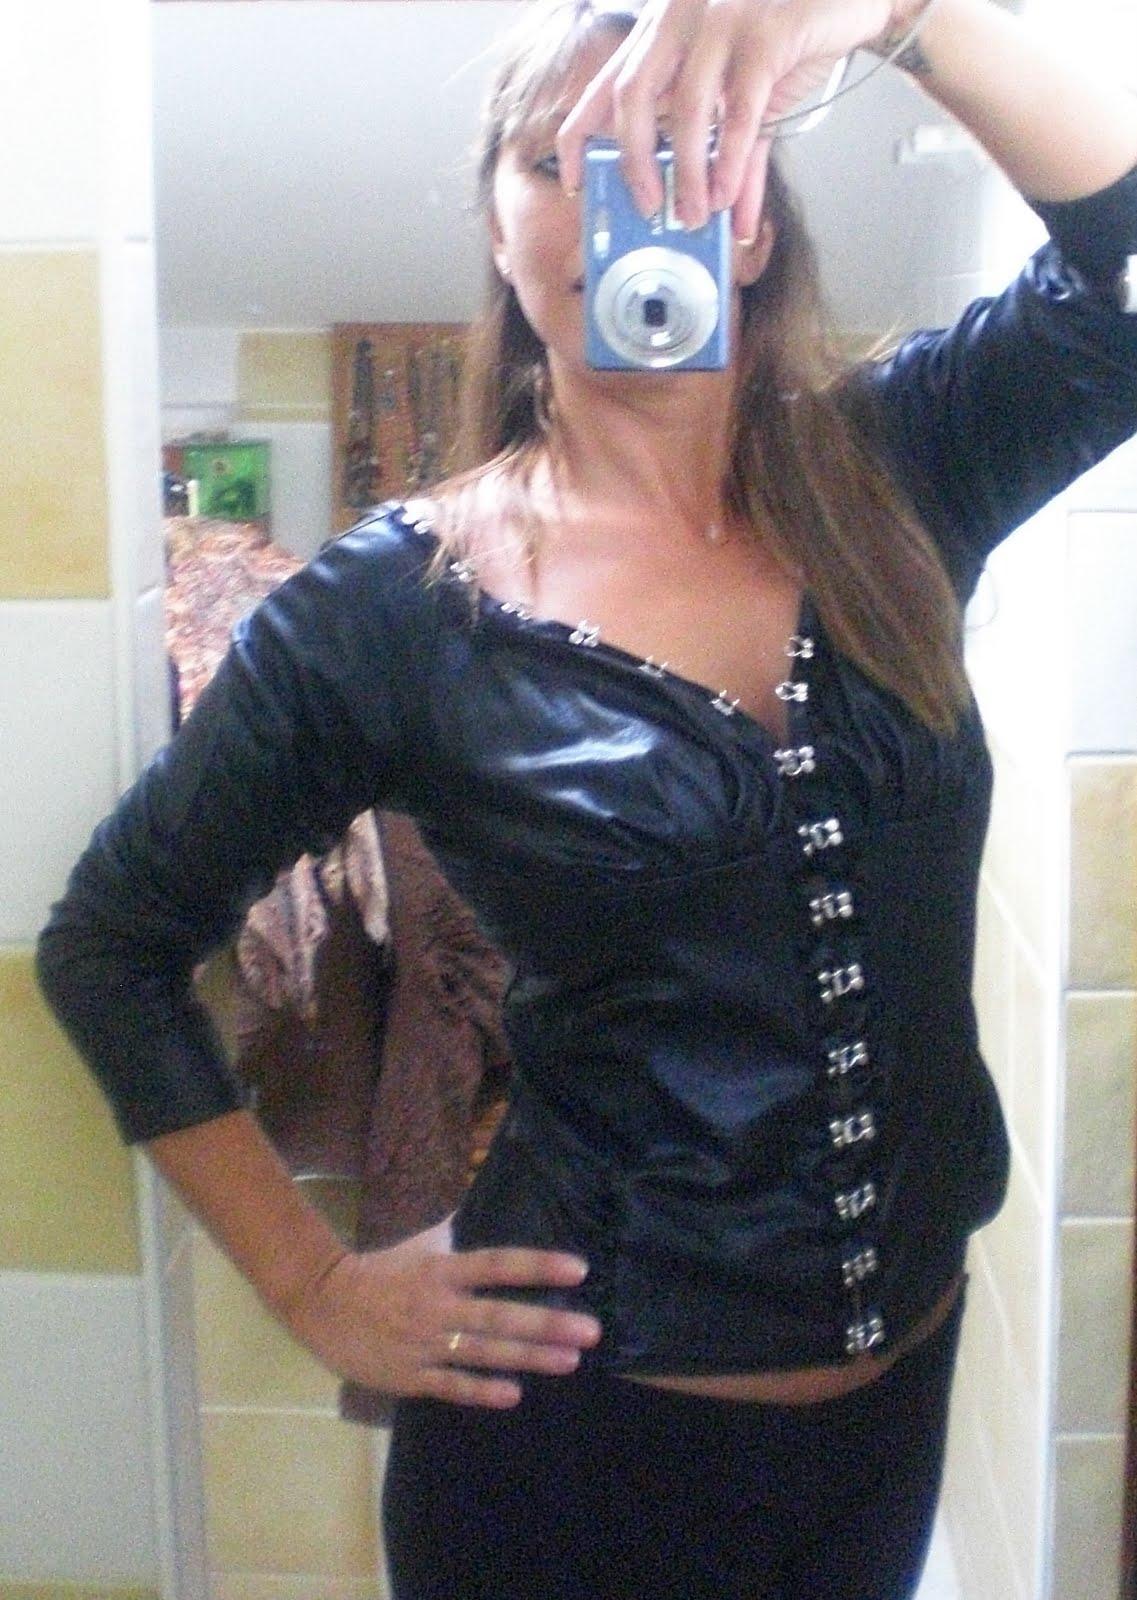 Miss coco vide son dressing montpellier h rault 34 super sexy chemisier noir t 3 - Vide dressing montpellier ...